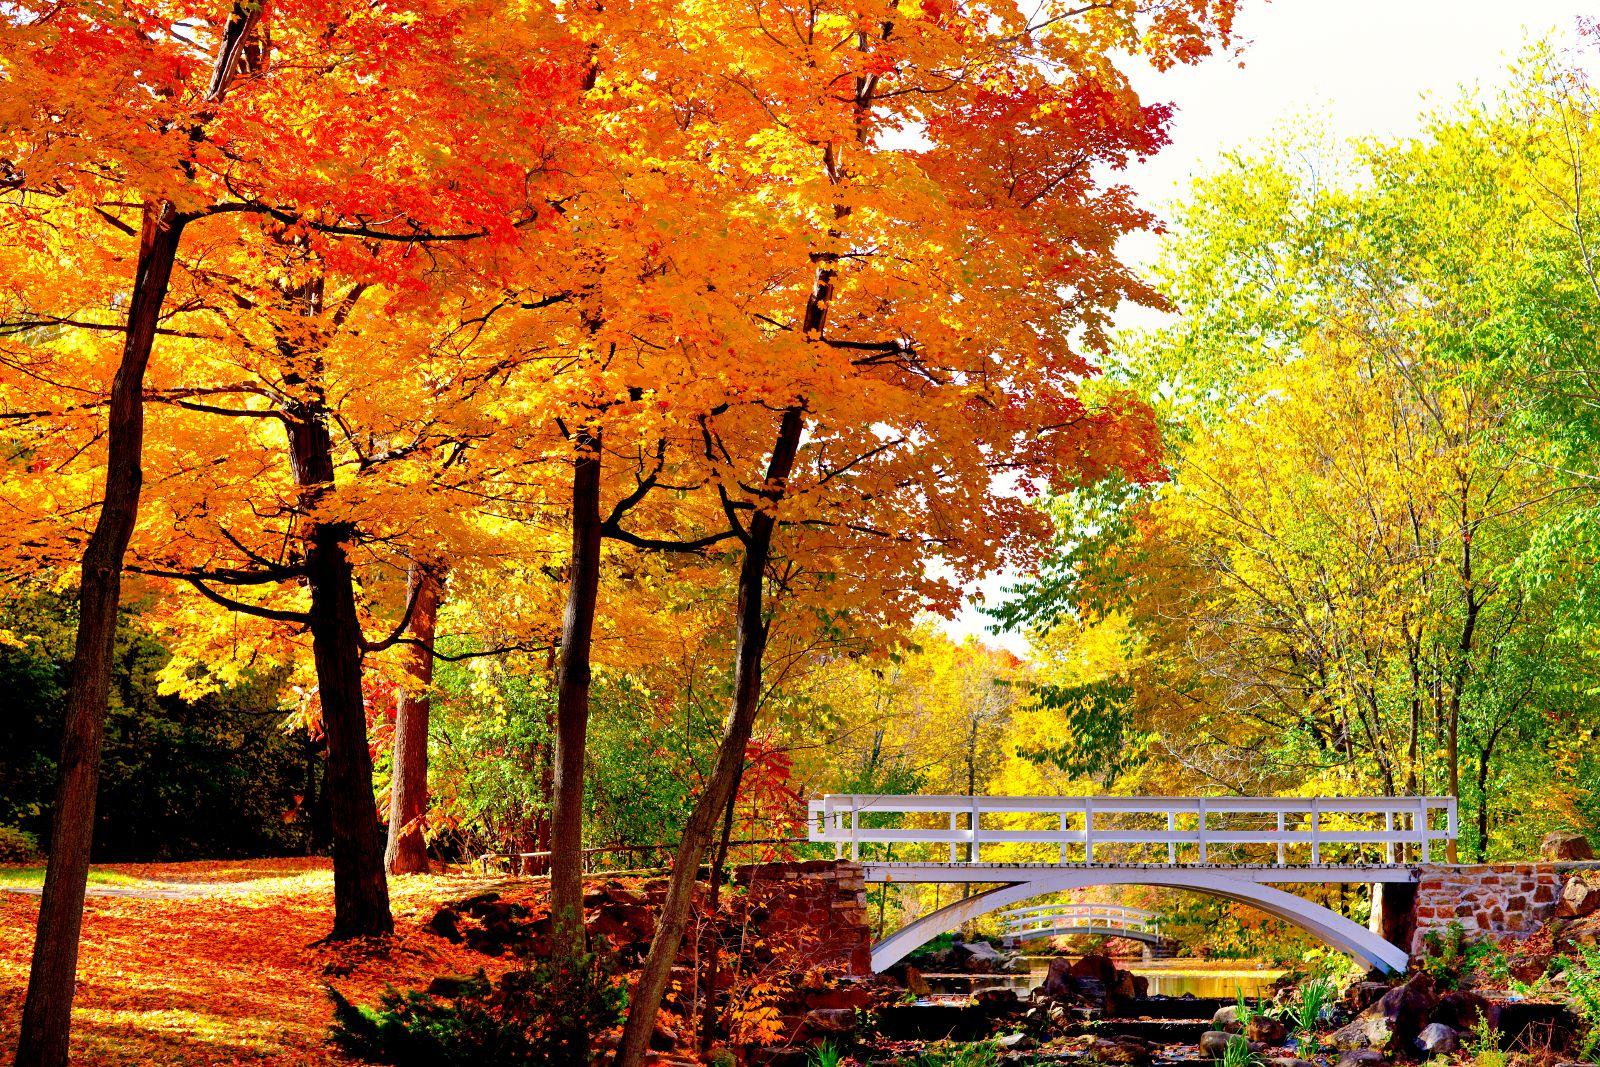 Montreal Fall Foliage: Top Leaf-Peeping Destinations